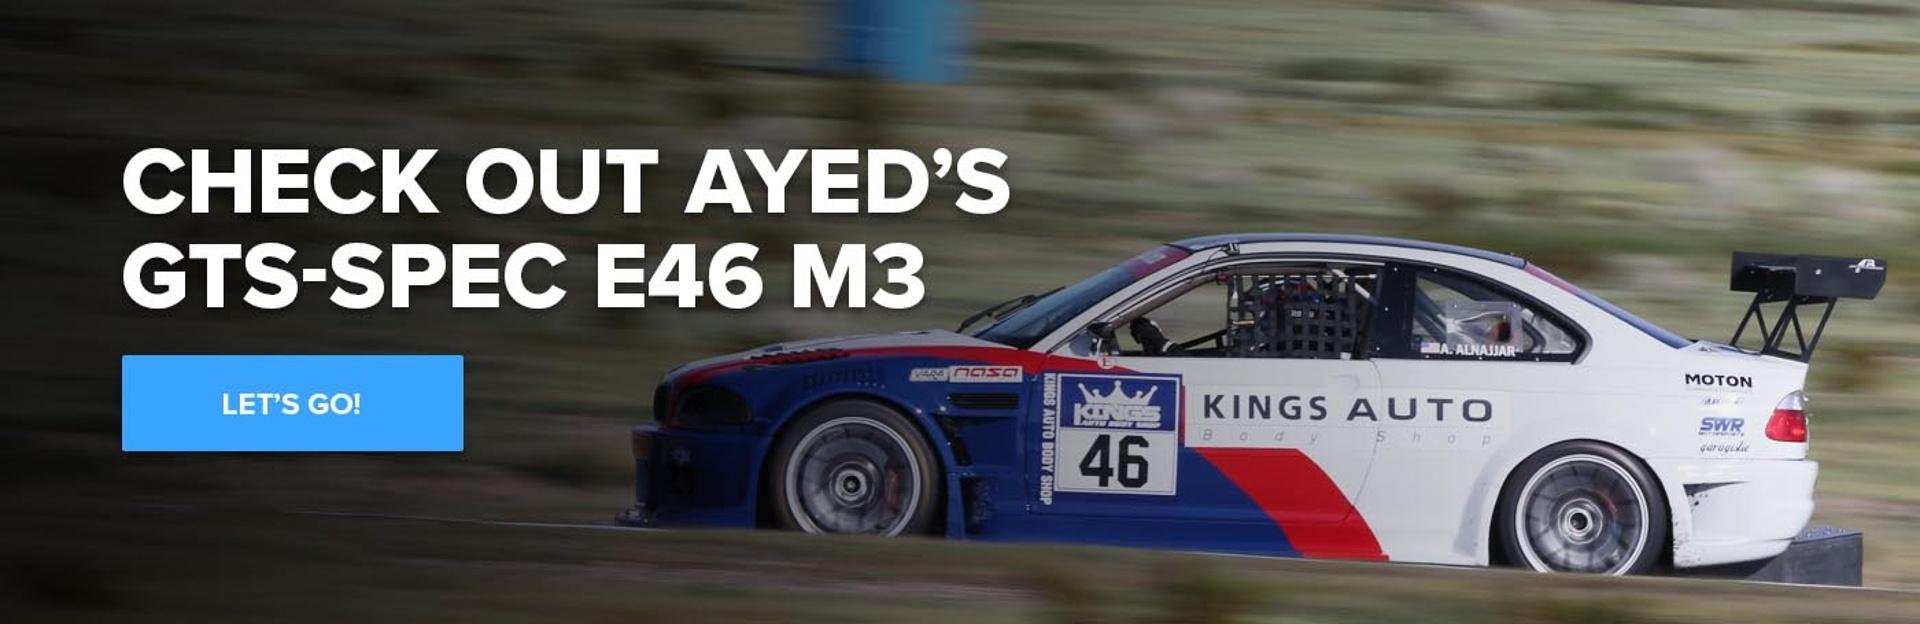 NASA GTS-SPEC BMW E46 M3 CTA